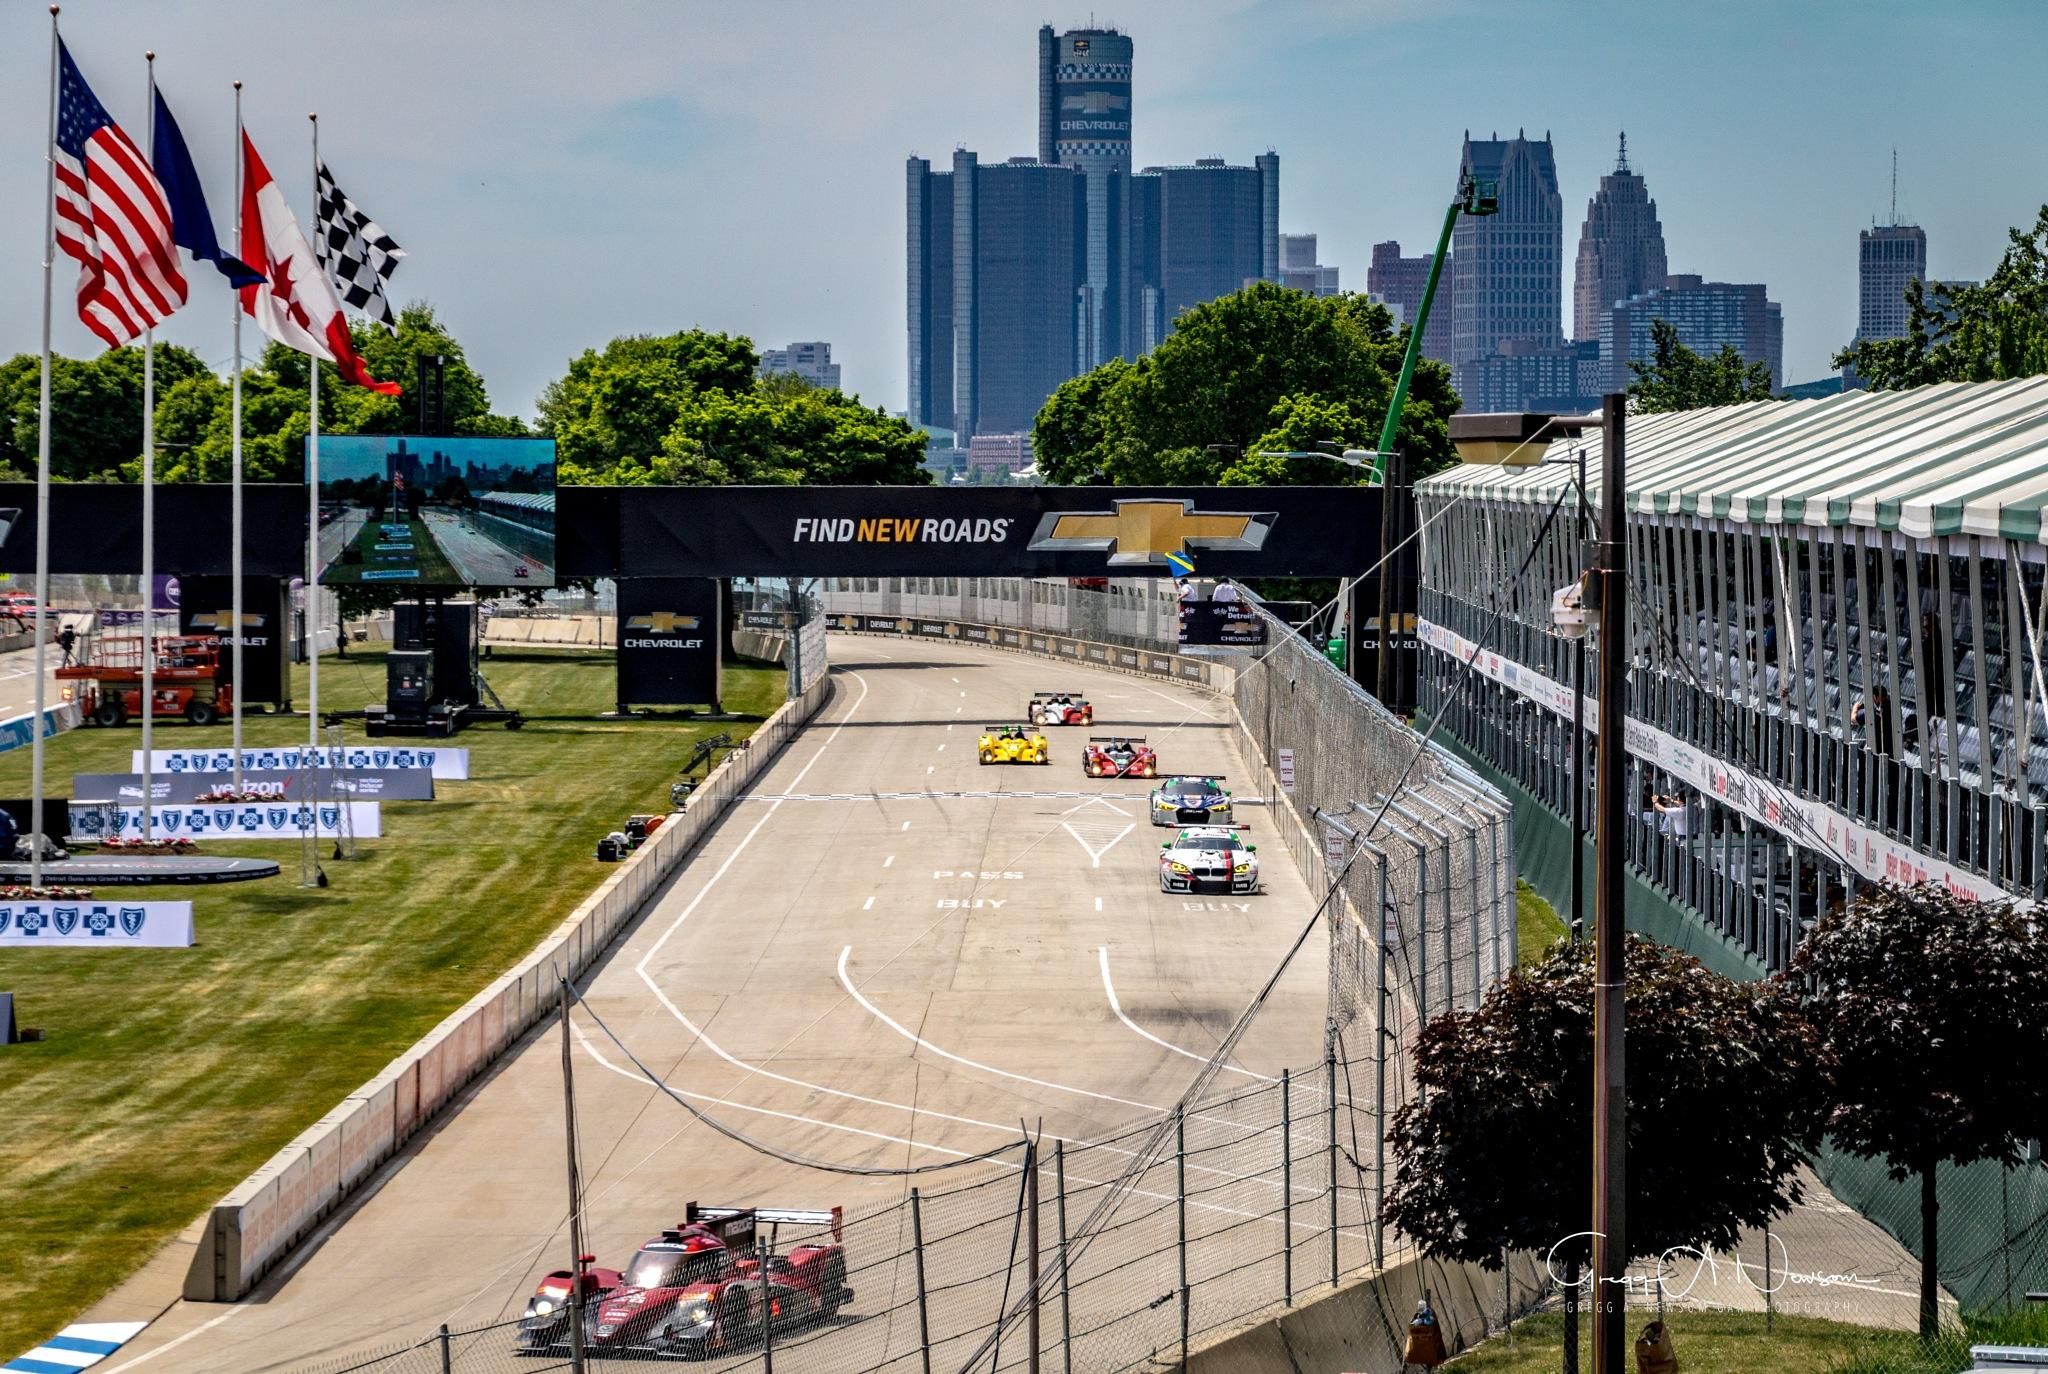 Detroit Grand Prix by Gnewsom324